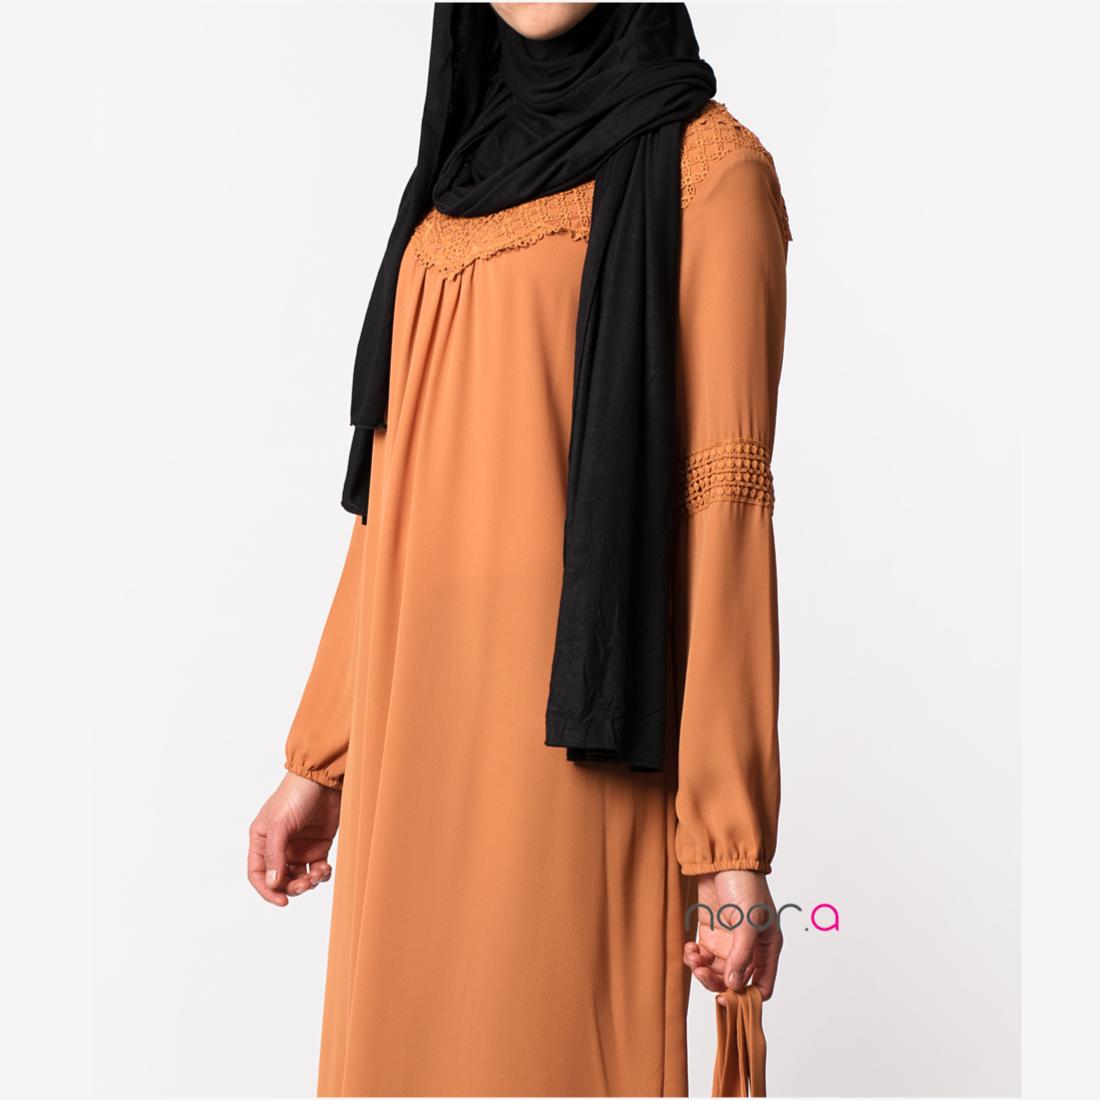 hijab_XXL_NOIR